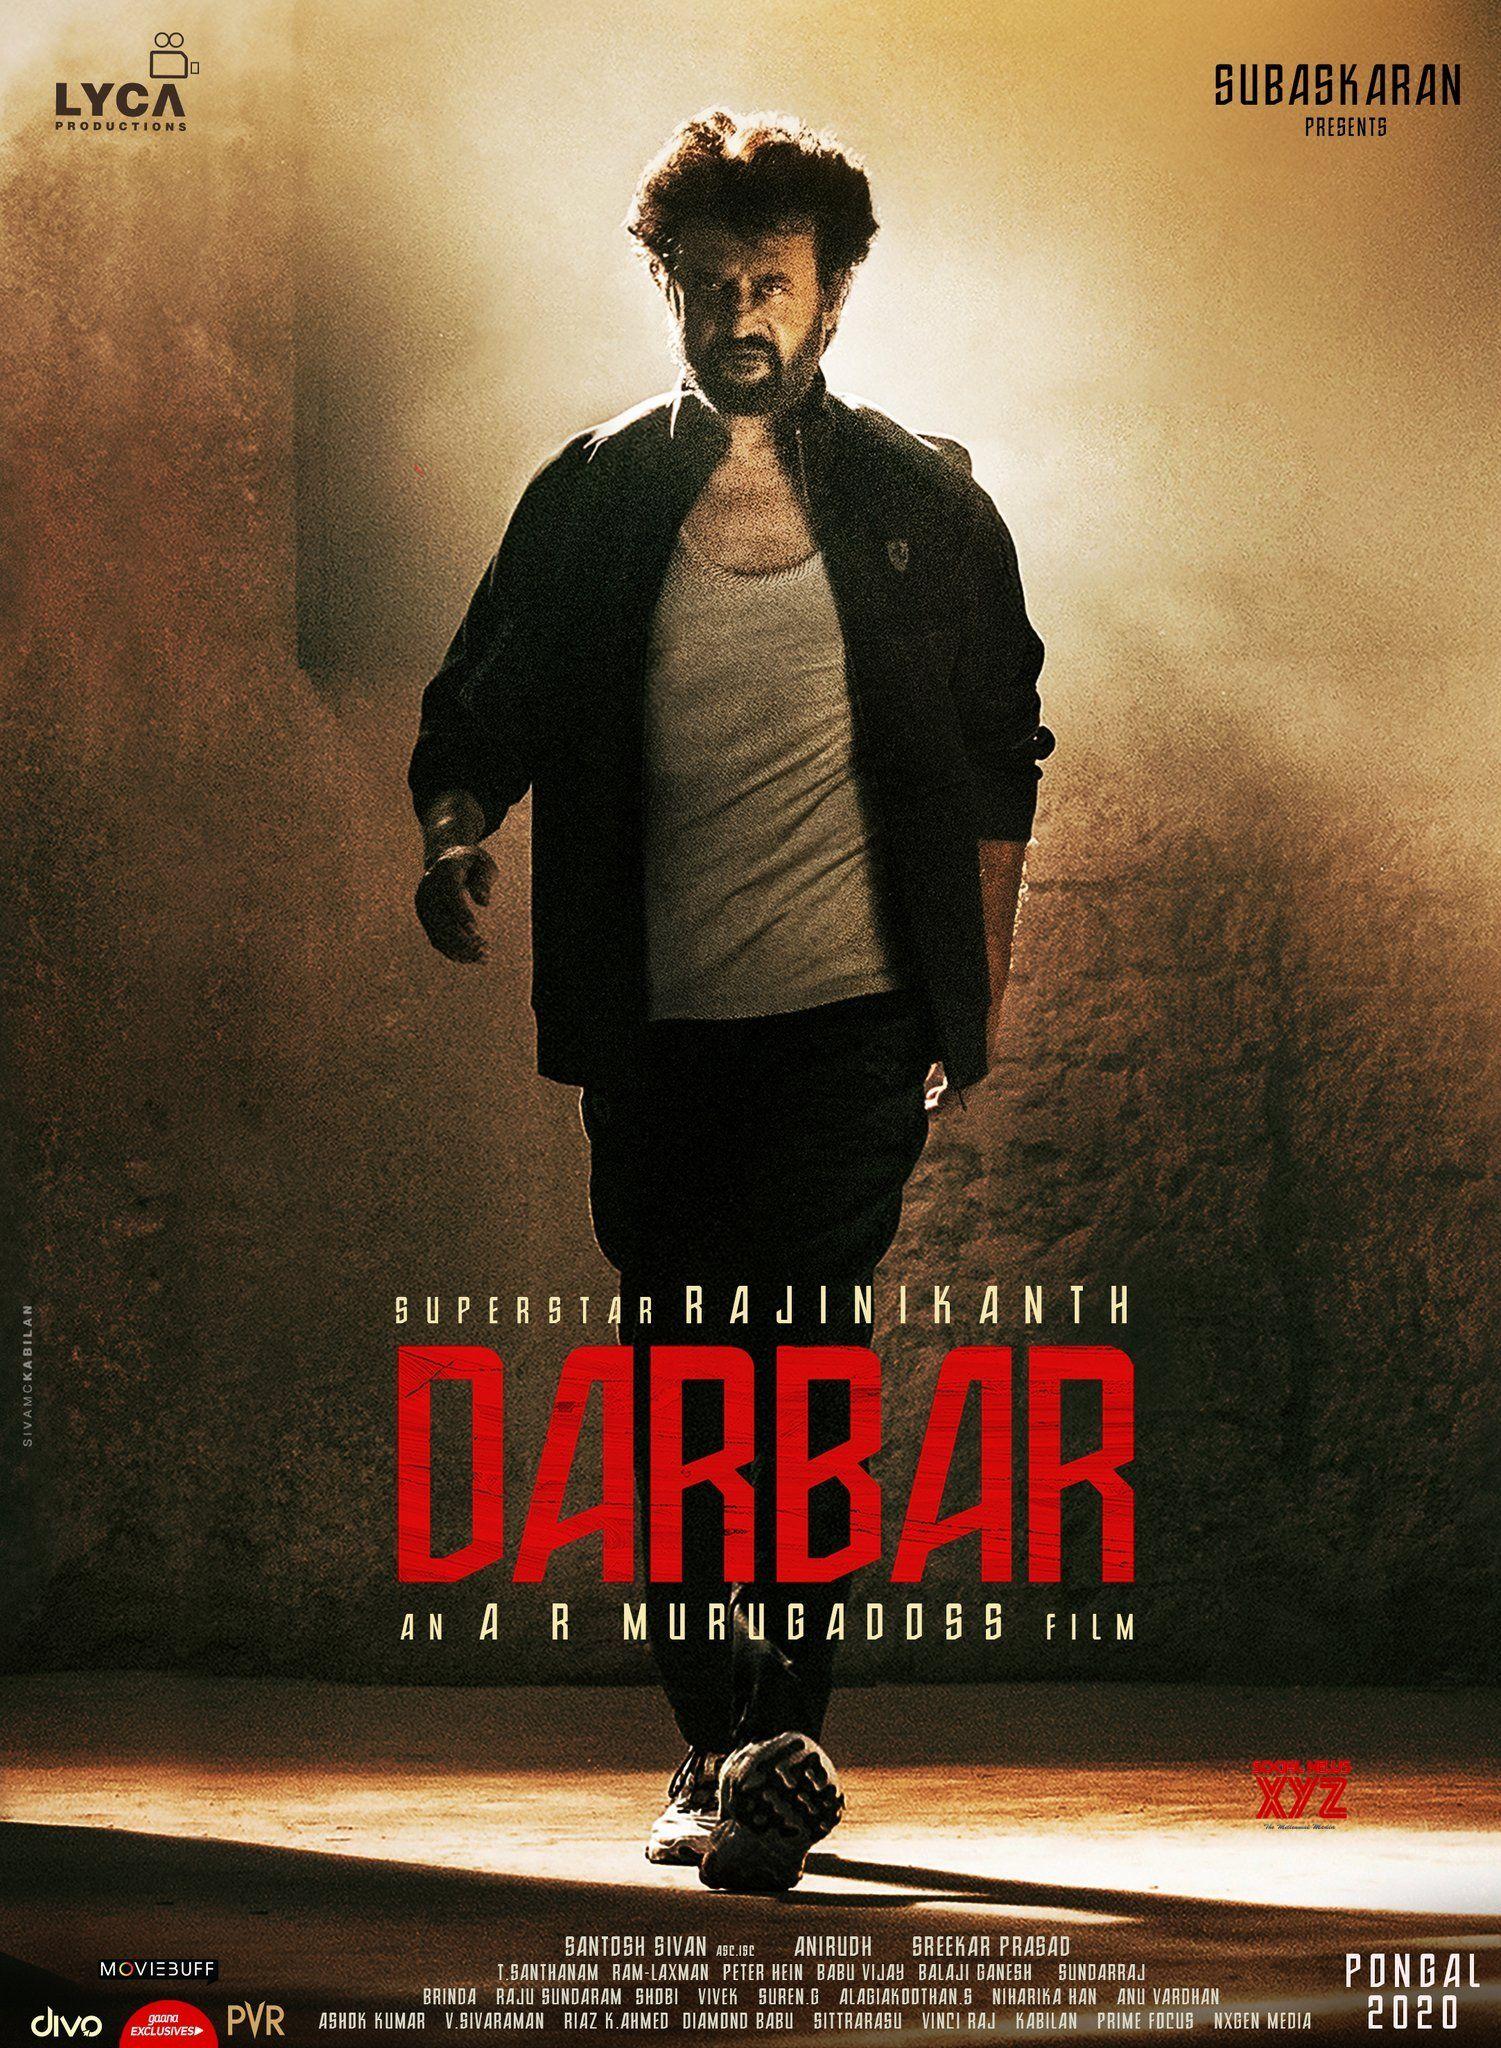 Superstar Rajinikanth S Darbar Movie Releasing For Pongal 2020 Posters Superstarrajinikanth Darbar Best New Movies Comedy Films Hd Movies Download